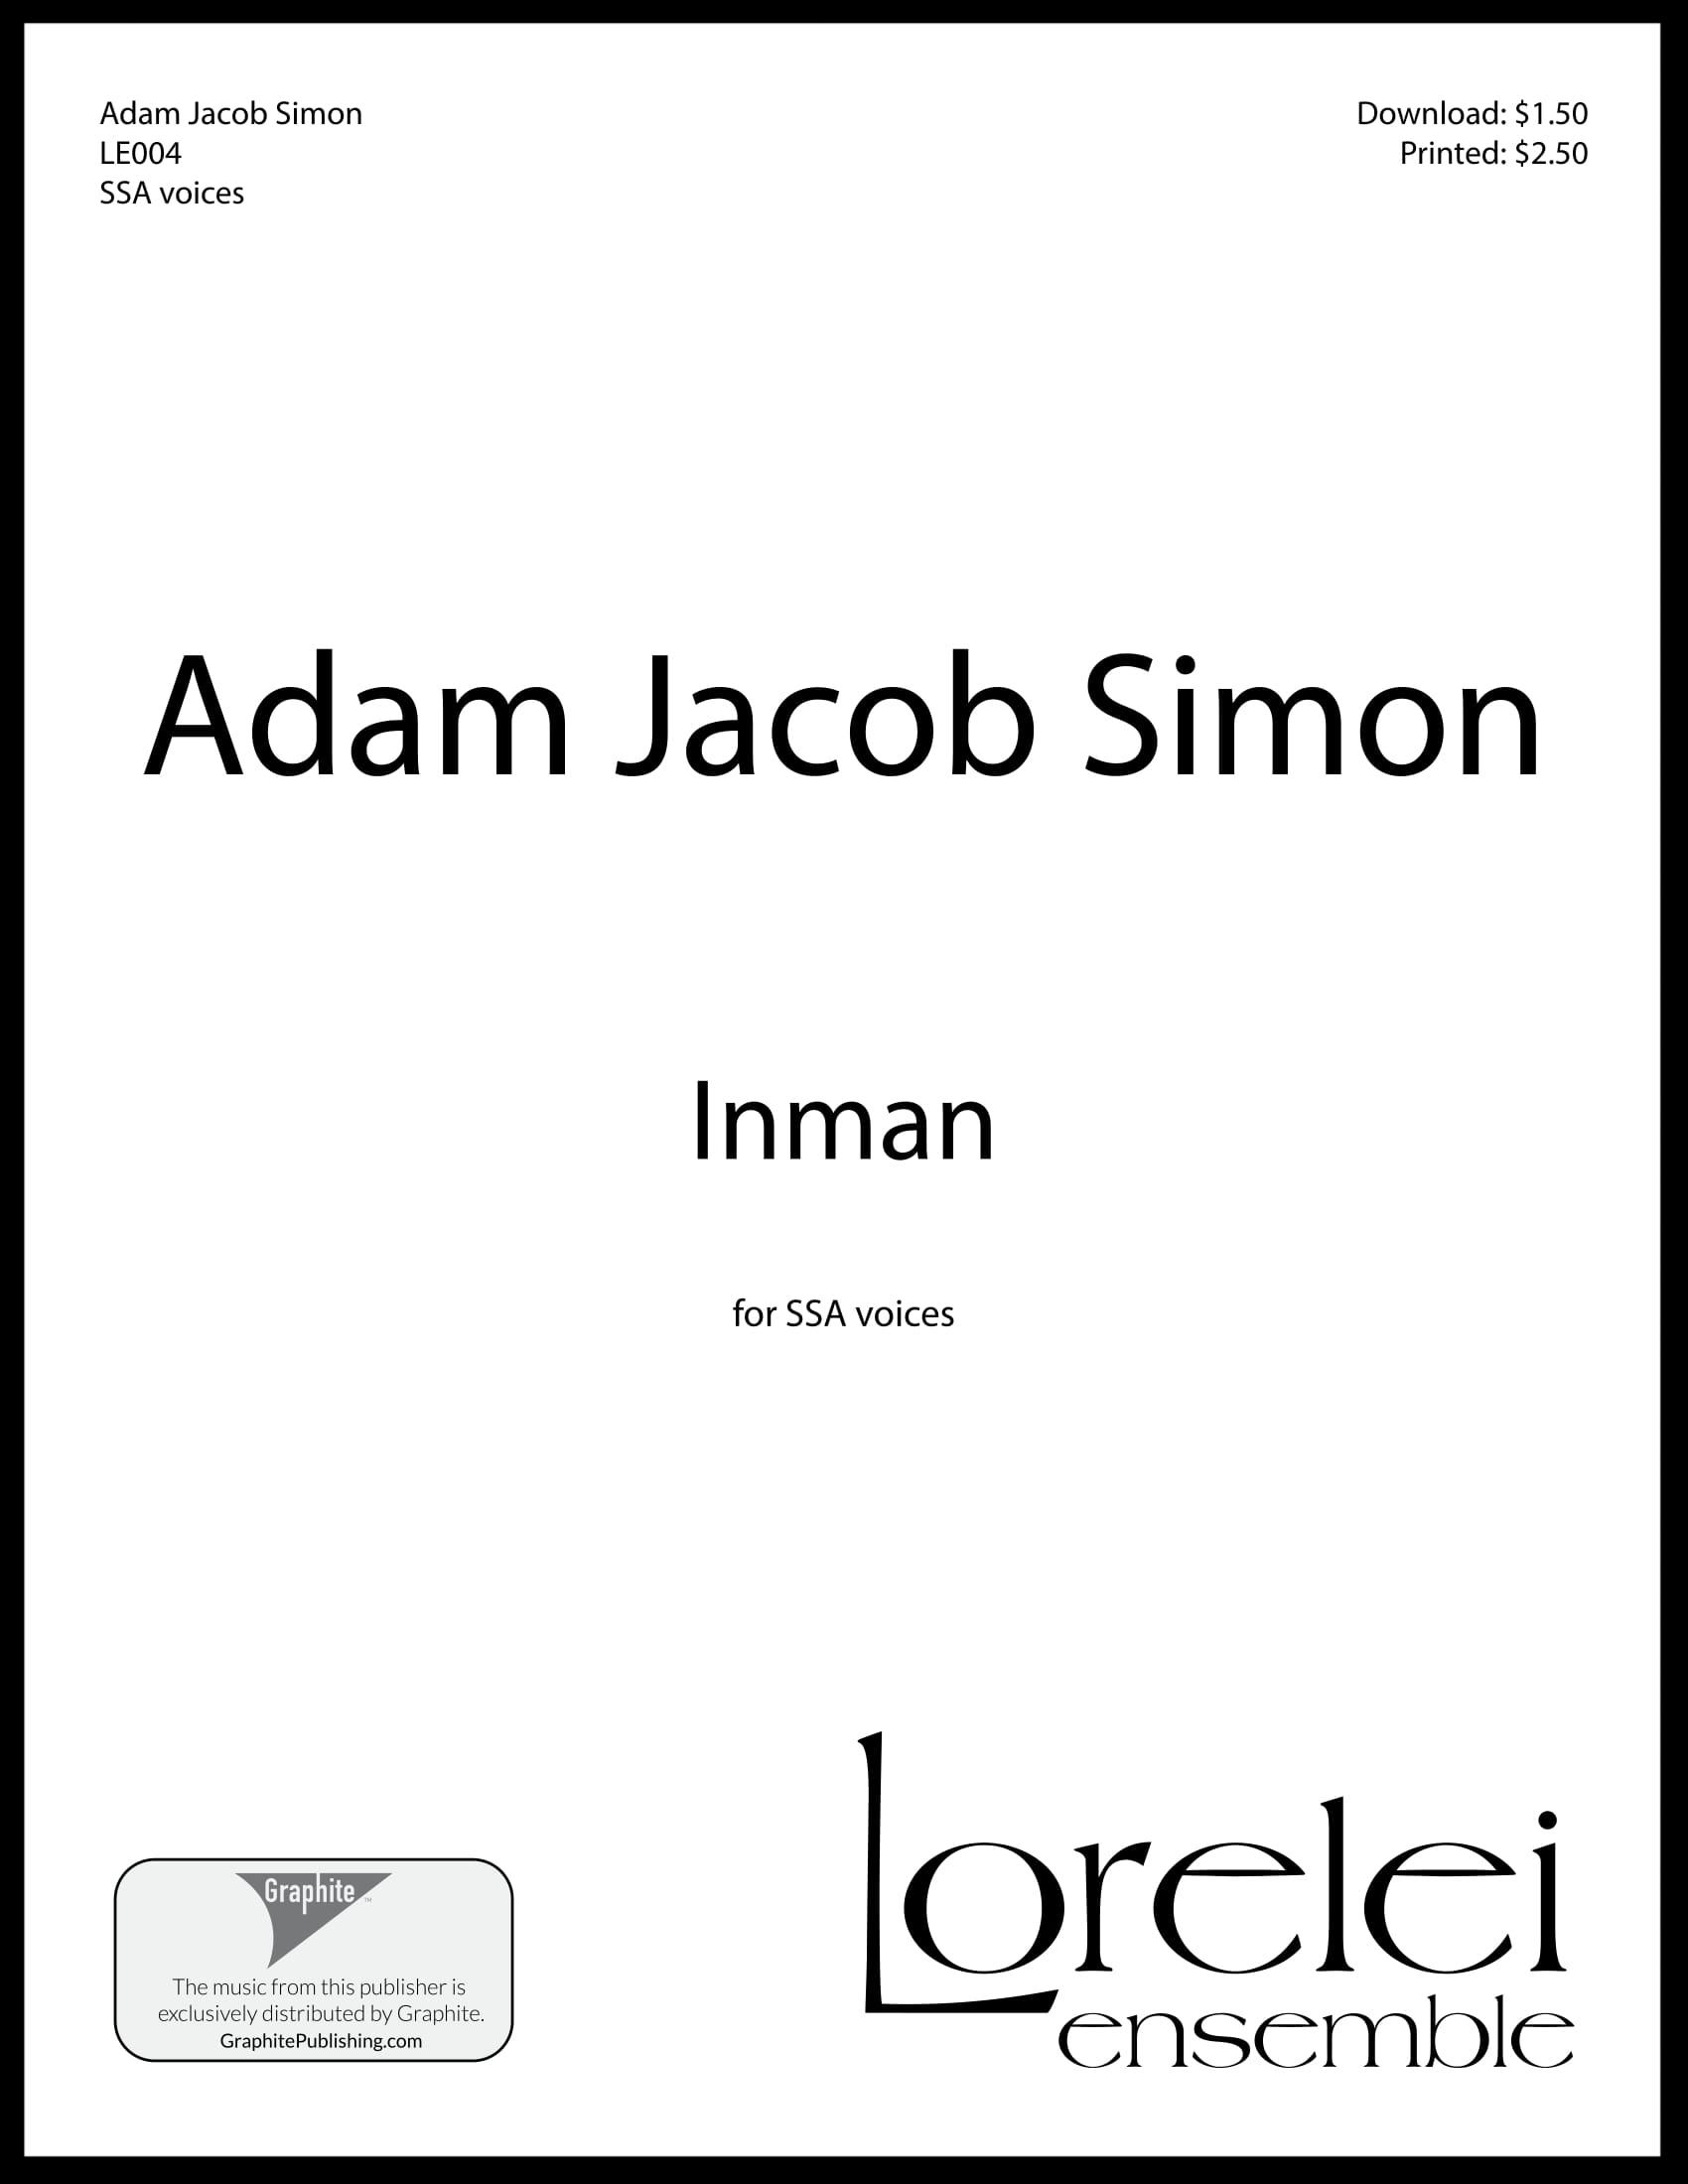 LE004-Simon-Inman-WATERMARKED-1.jpg